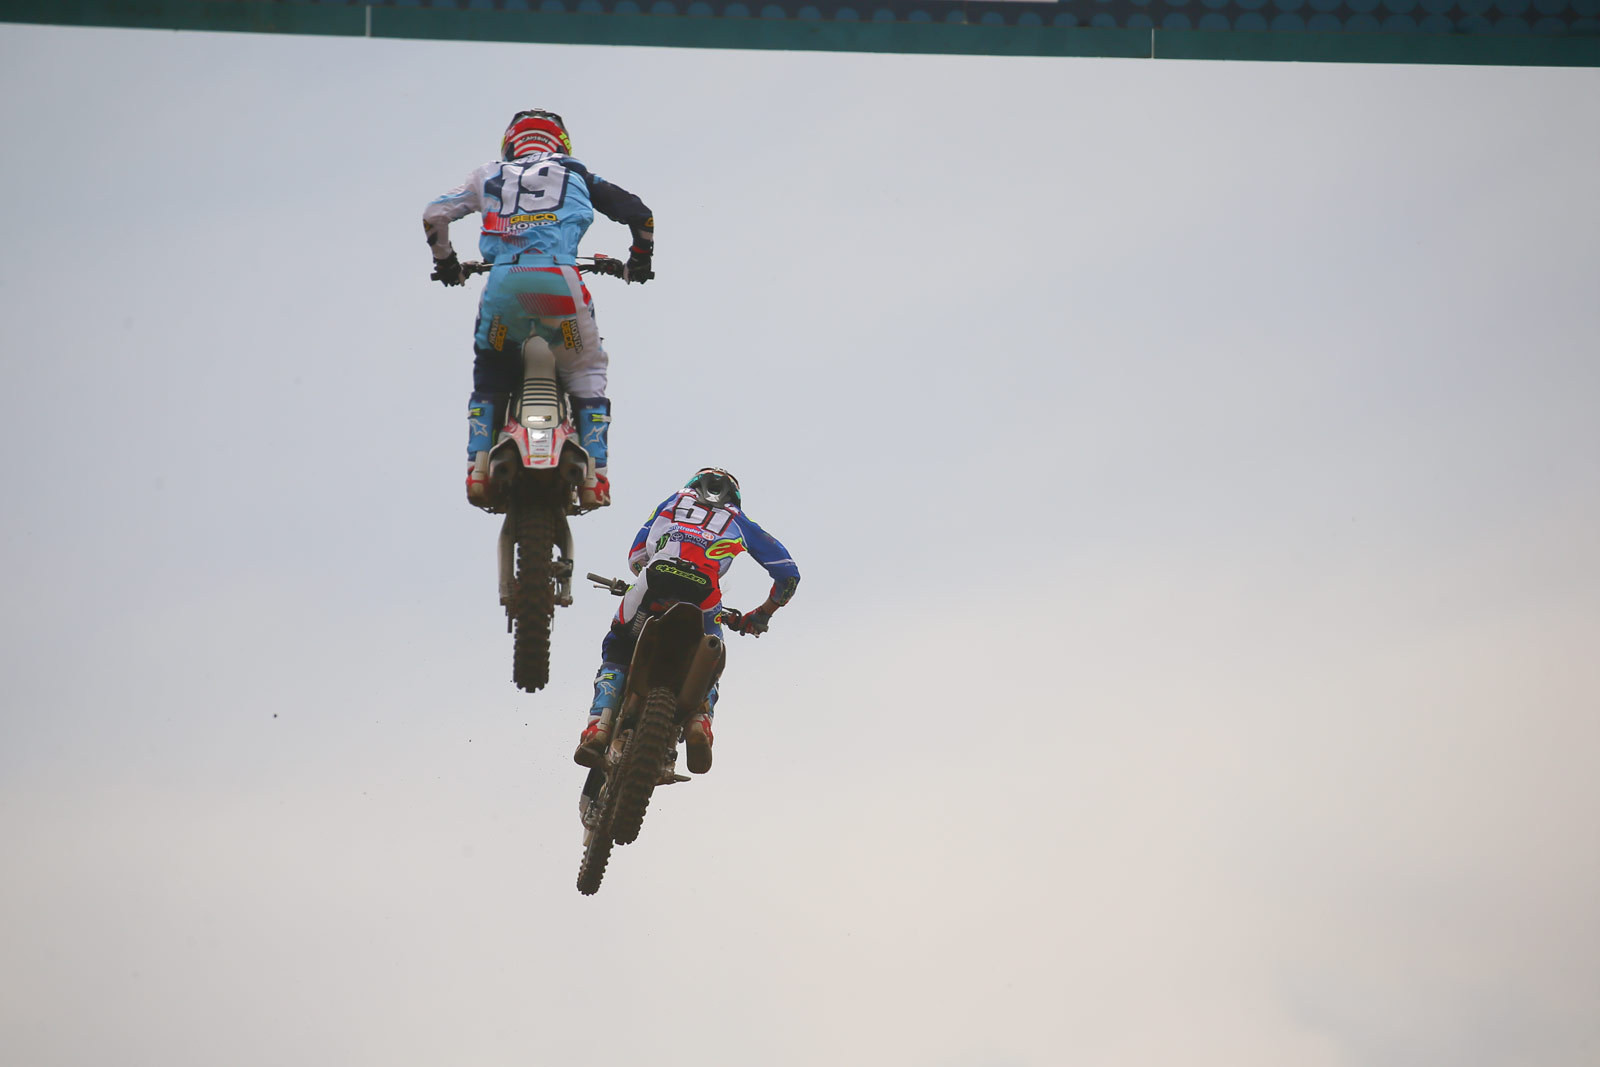 Justin Bogle and Justin Barcia - Photo Blast: RedBud - Motocross Pictures - Vital MX